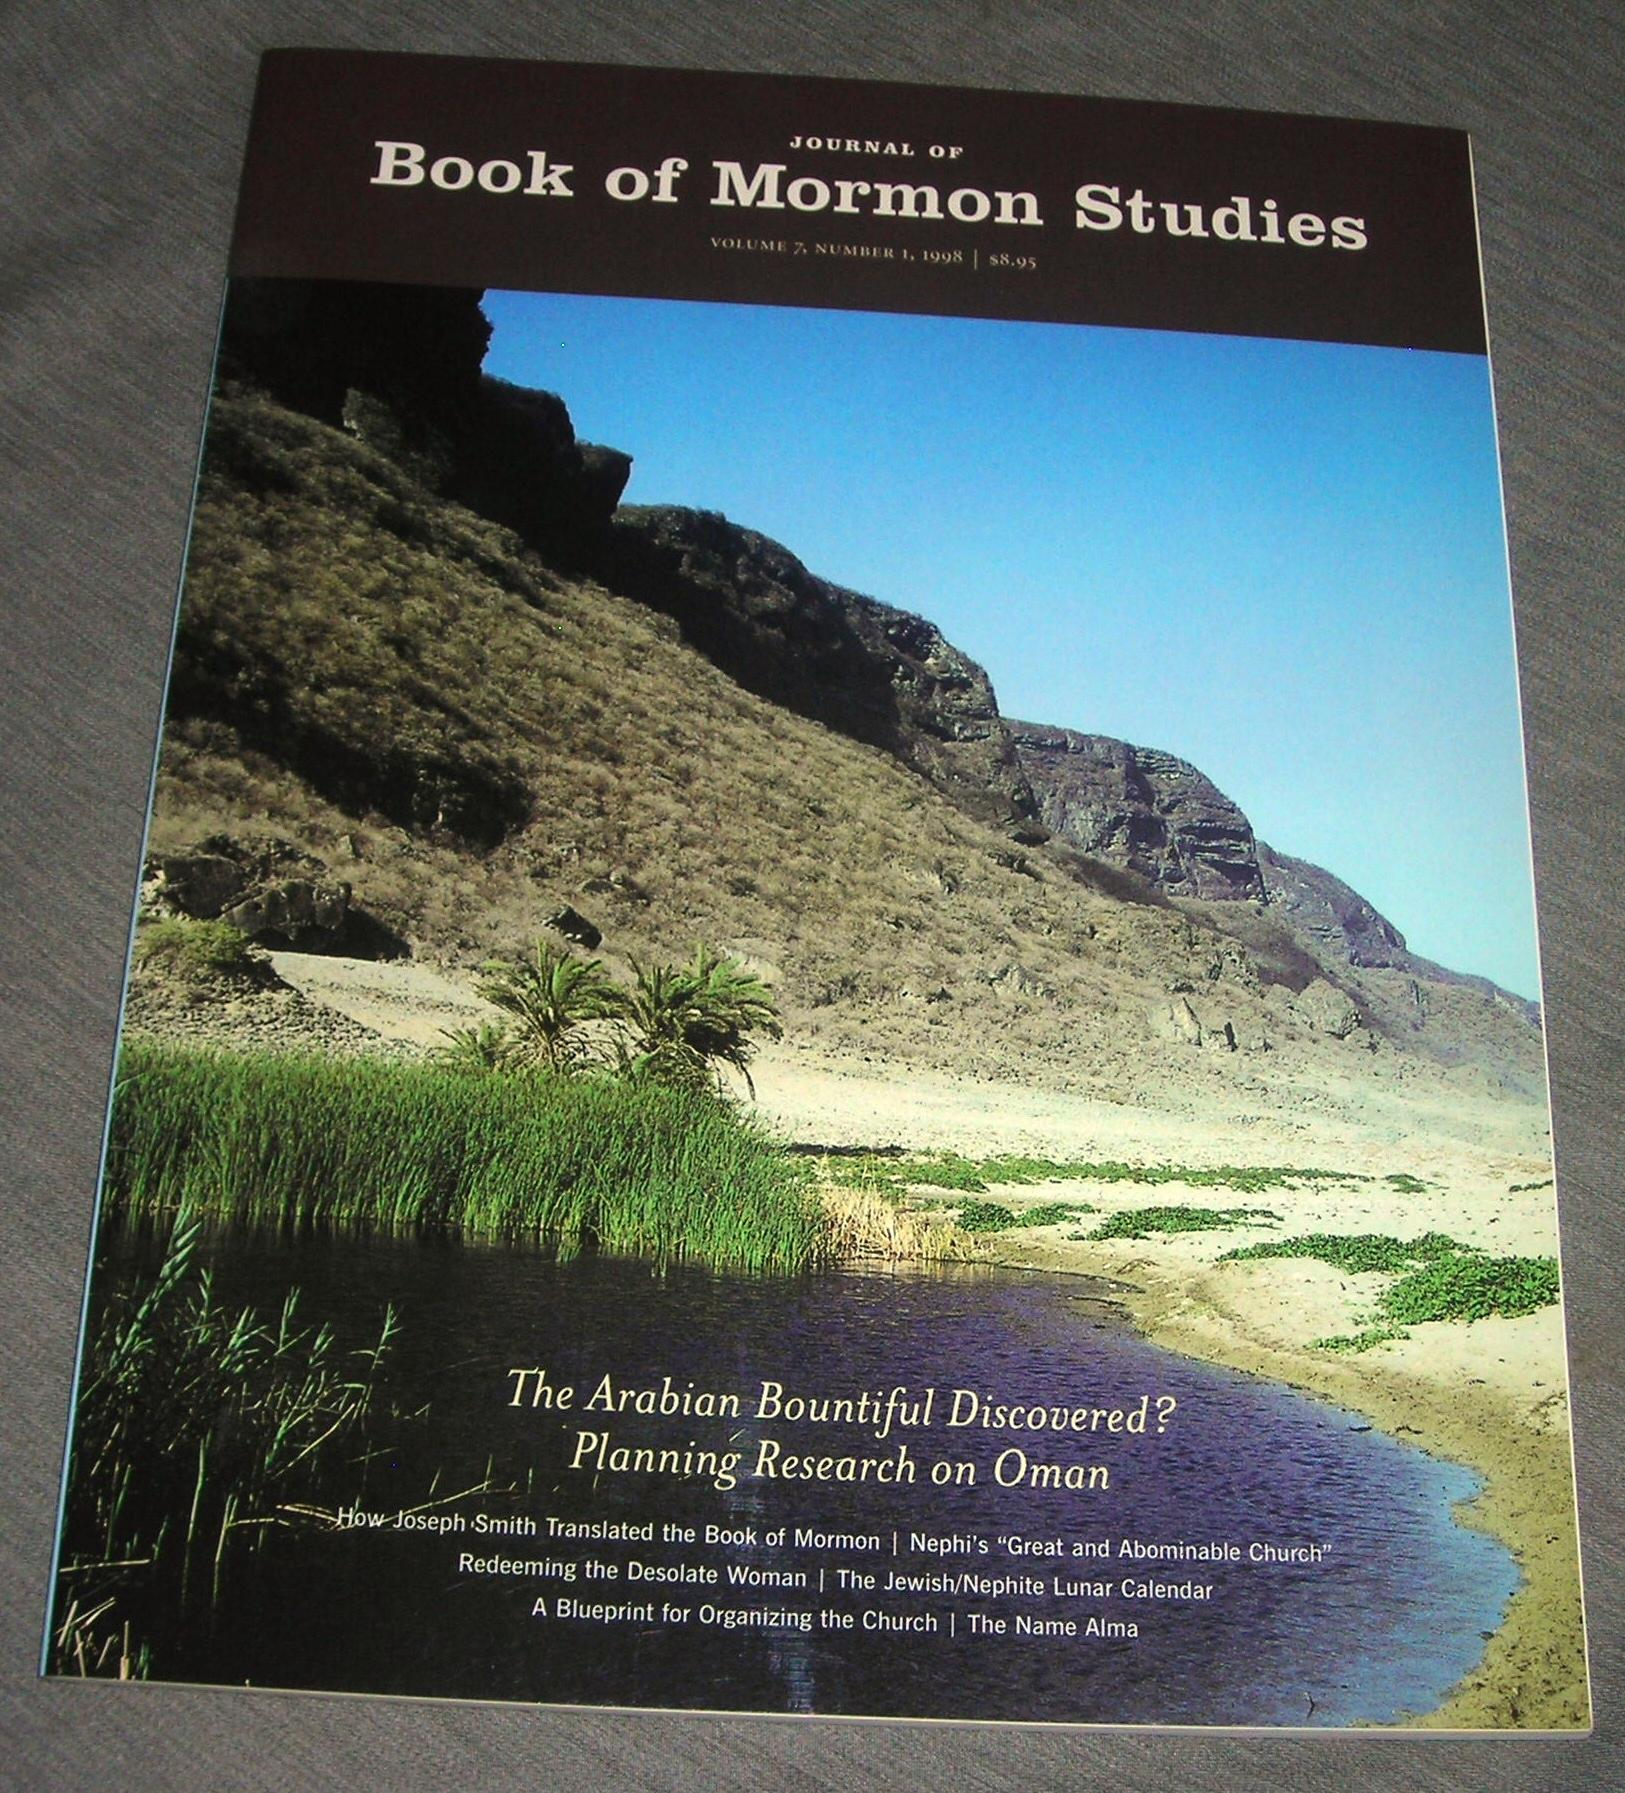 JOURNAL OF BOOK OF MORMON STUDIES Vol. 7 / Number 1 / 1998, Sorenson, John L. (editor)